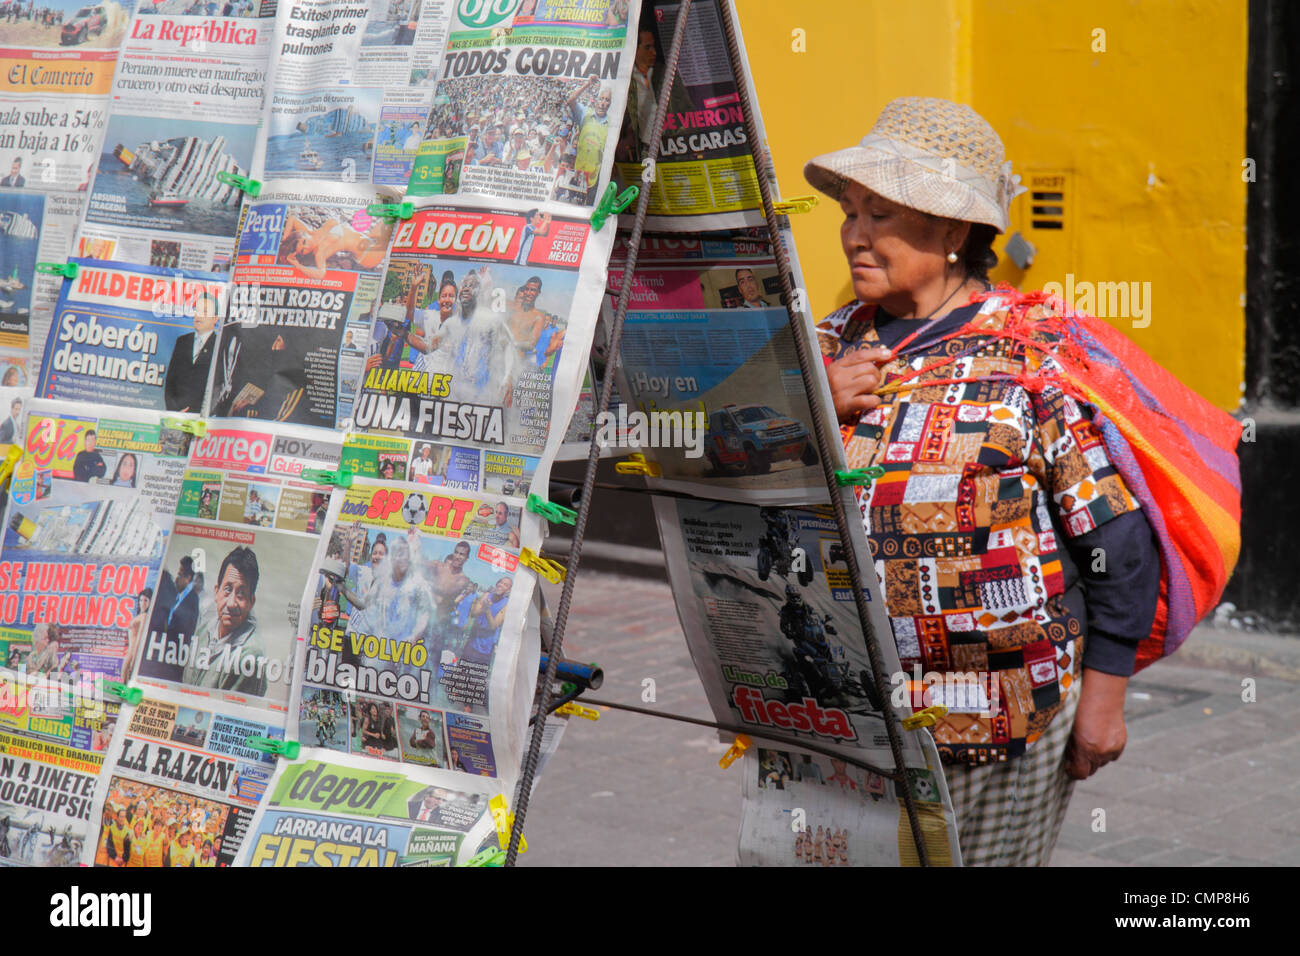 Lima Peru Barranco District Avenida Miguel Grau street scene newsstand newspaper periodical Spanish language headline - Stock Image